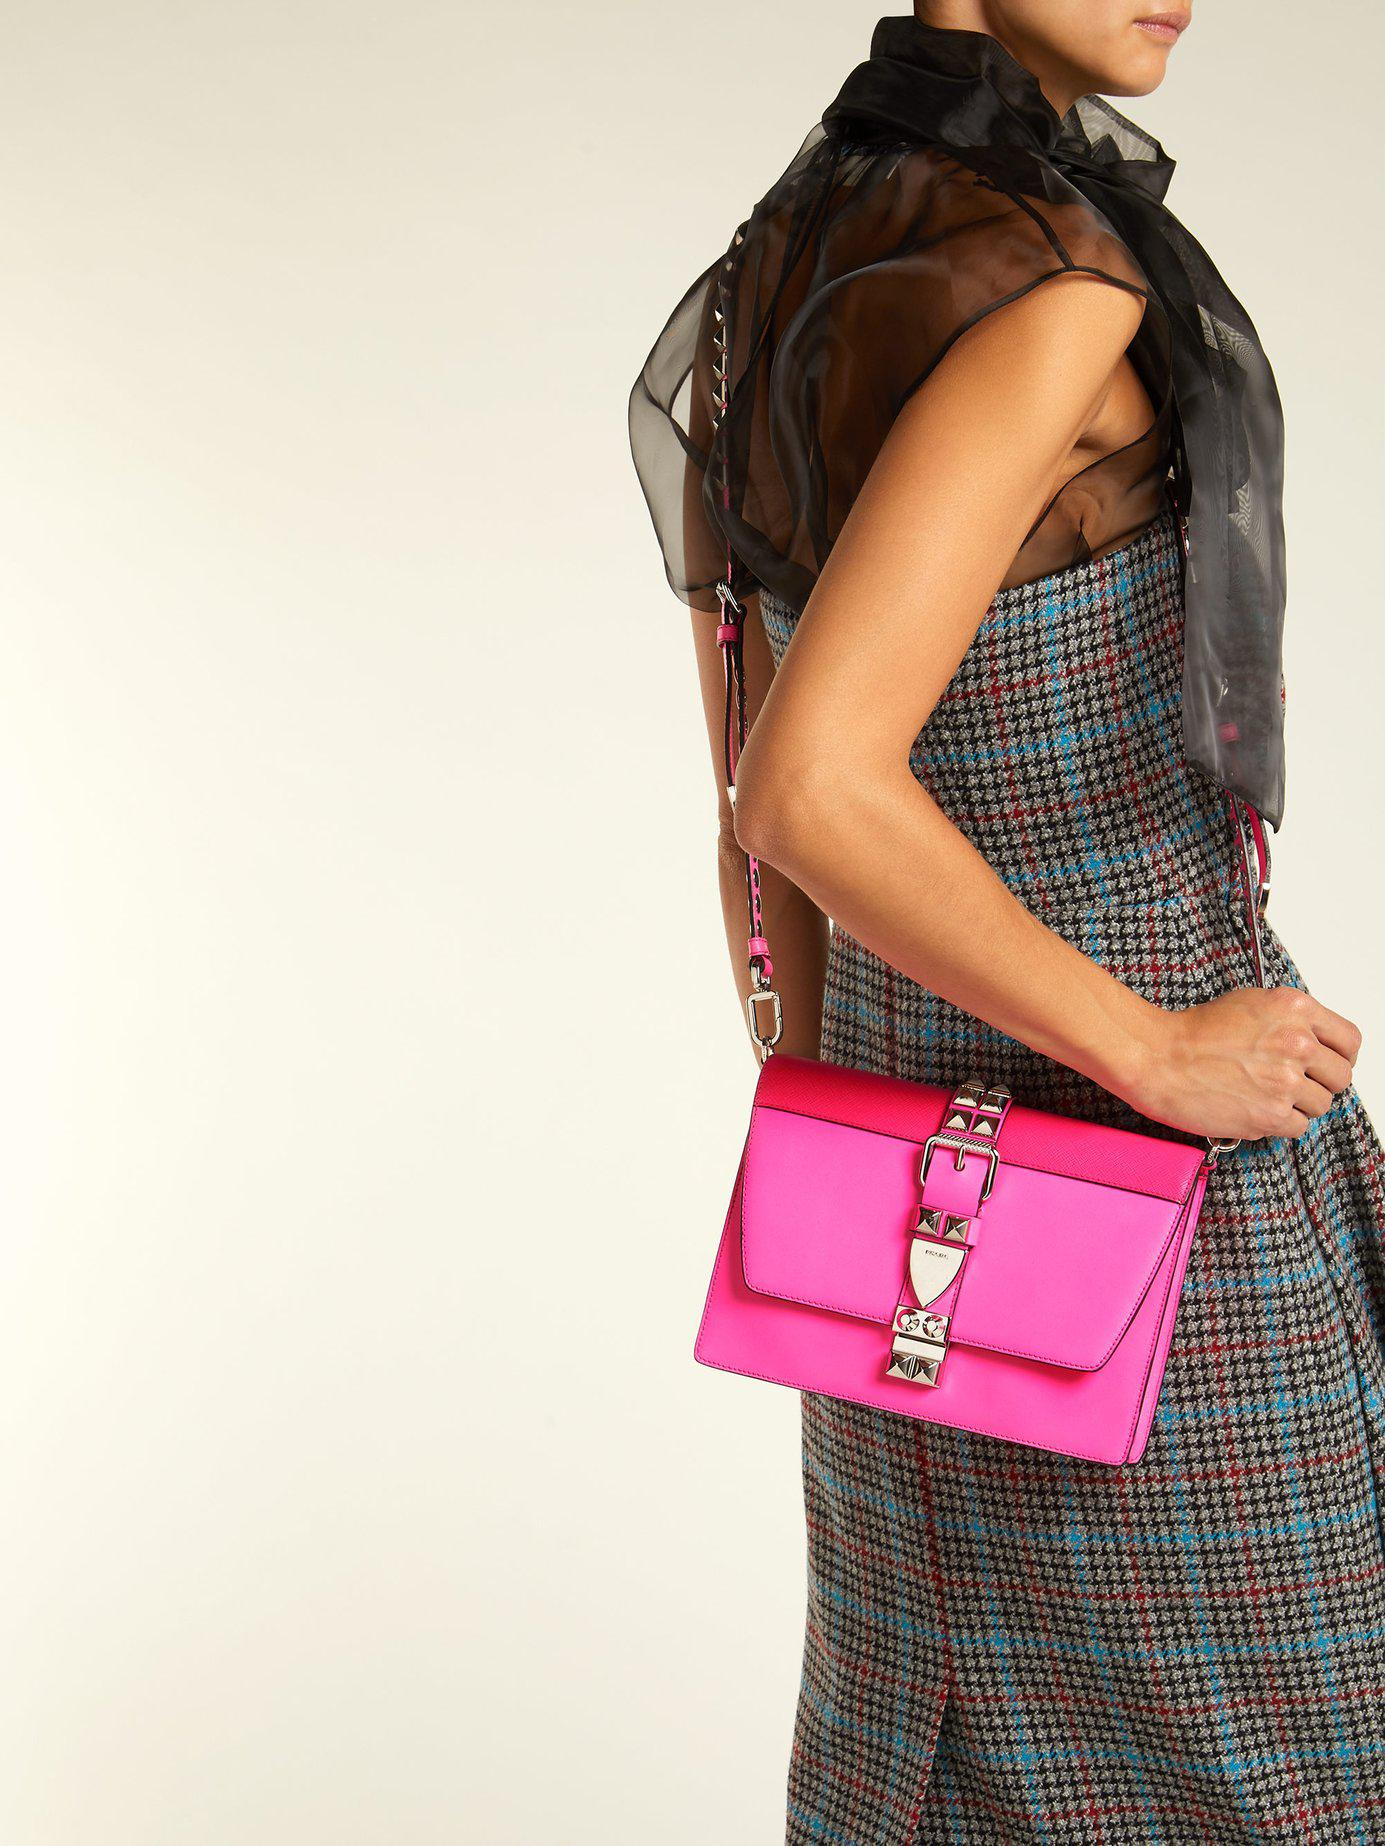 6036394b98a8 Lyst - Prada Elektra Studded Leather Shoulder Bag in Pink